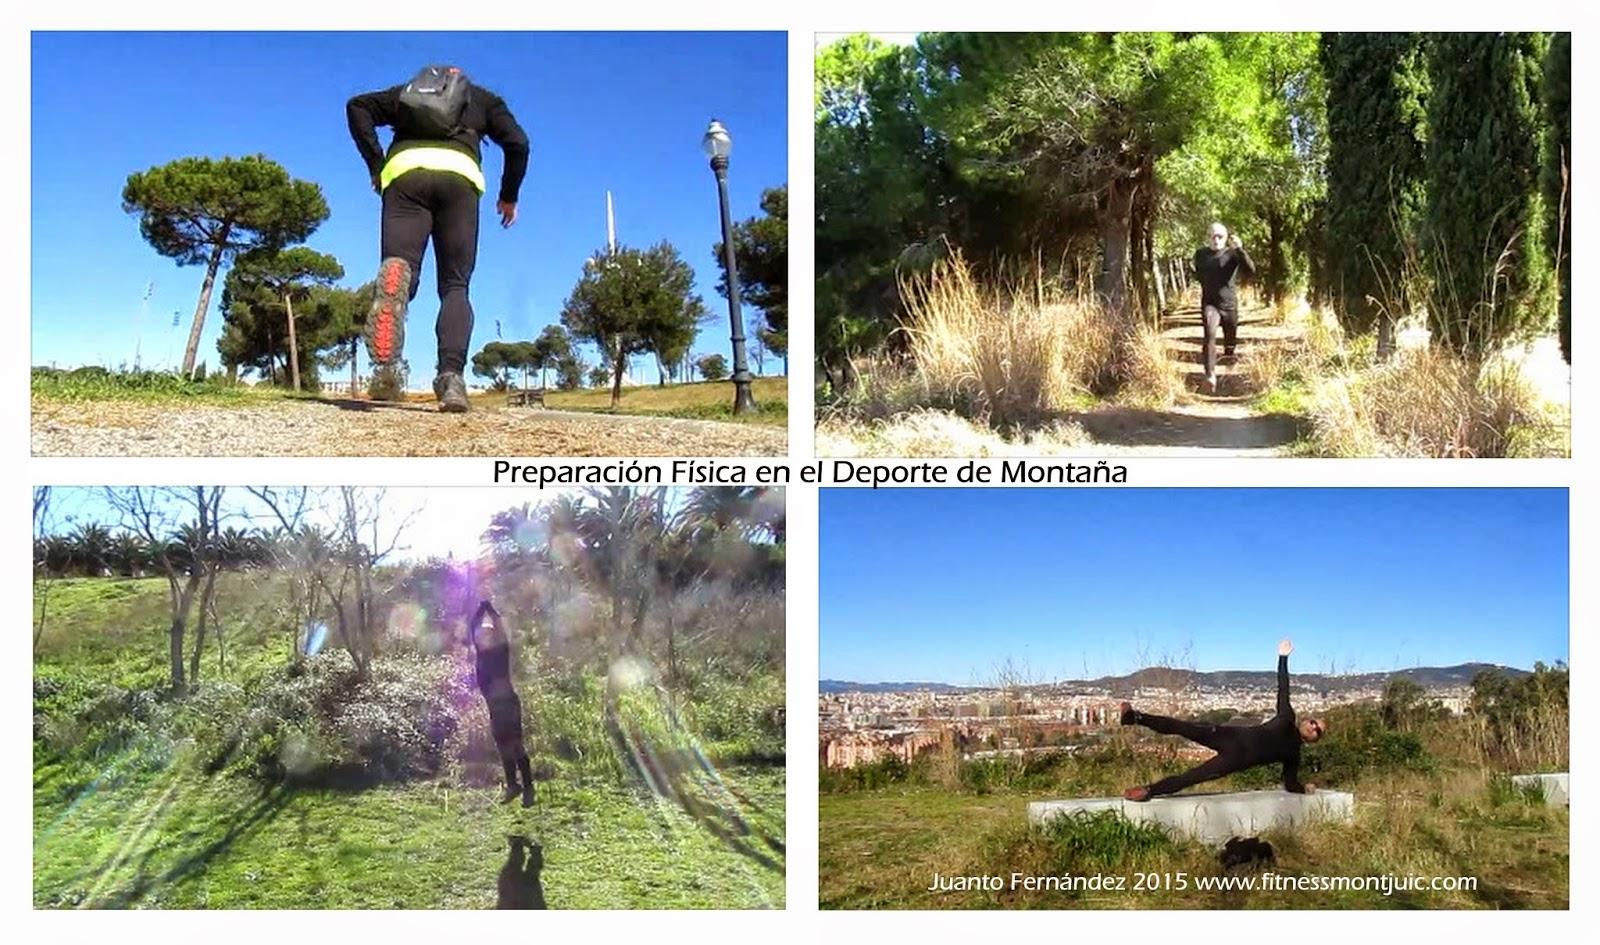 Preparación Física Deporte Montaña Fitness Montjuic